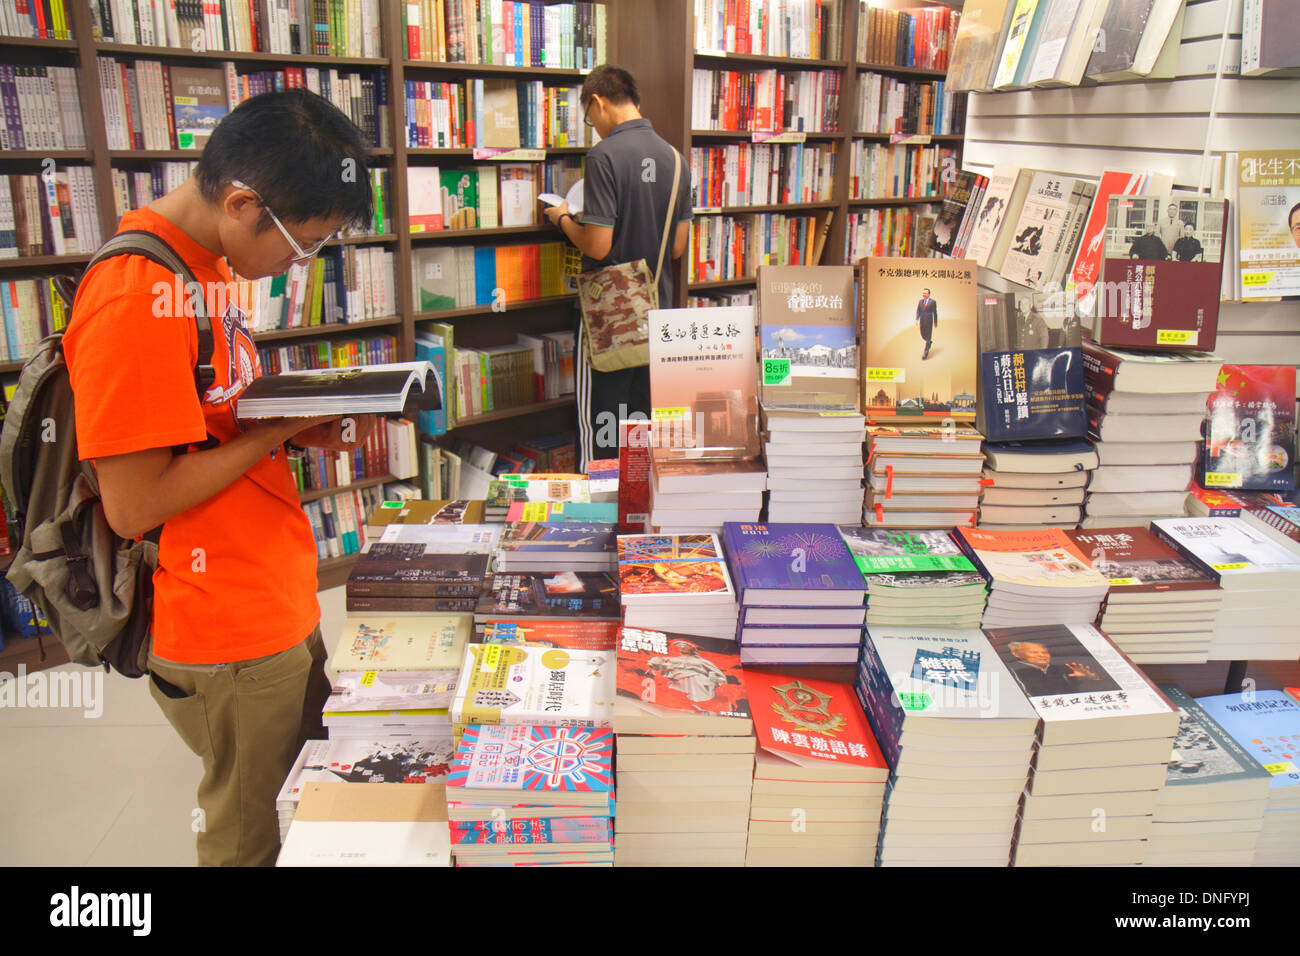 Hong Kong China Island Causeway Bay Yee Wo Street bookstore books sale display customer browsing Asian man Stock Photo